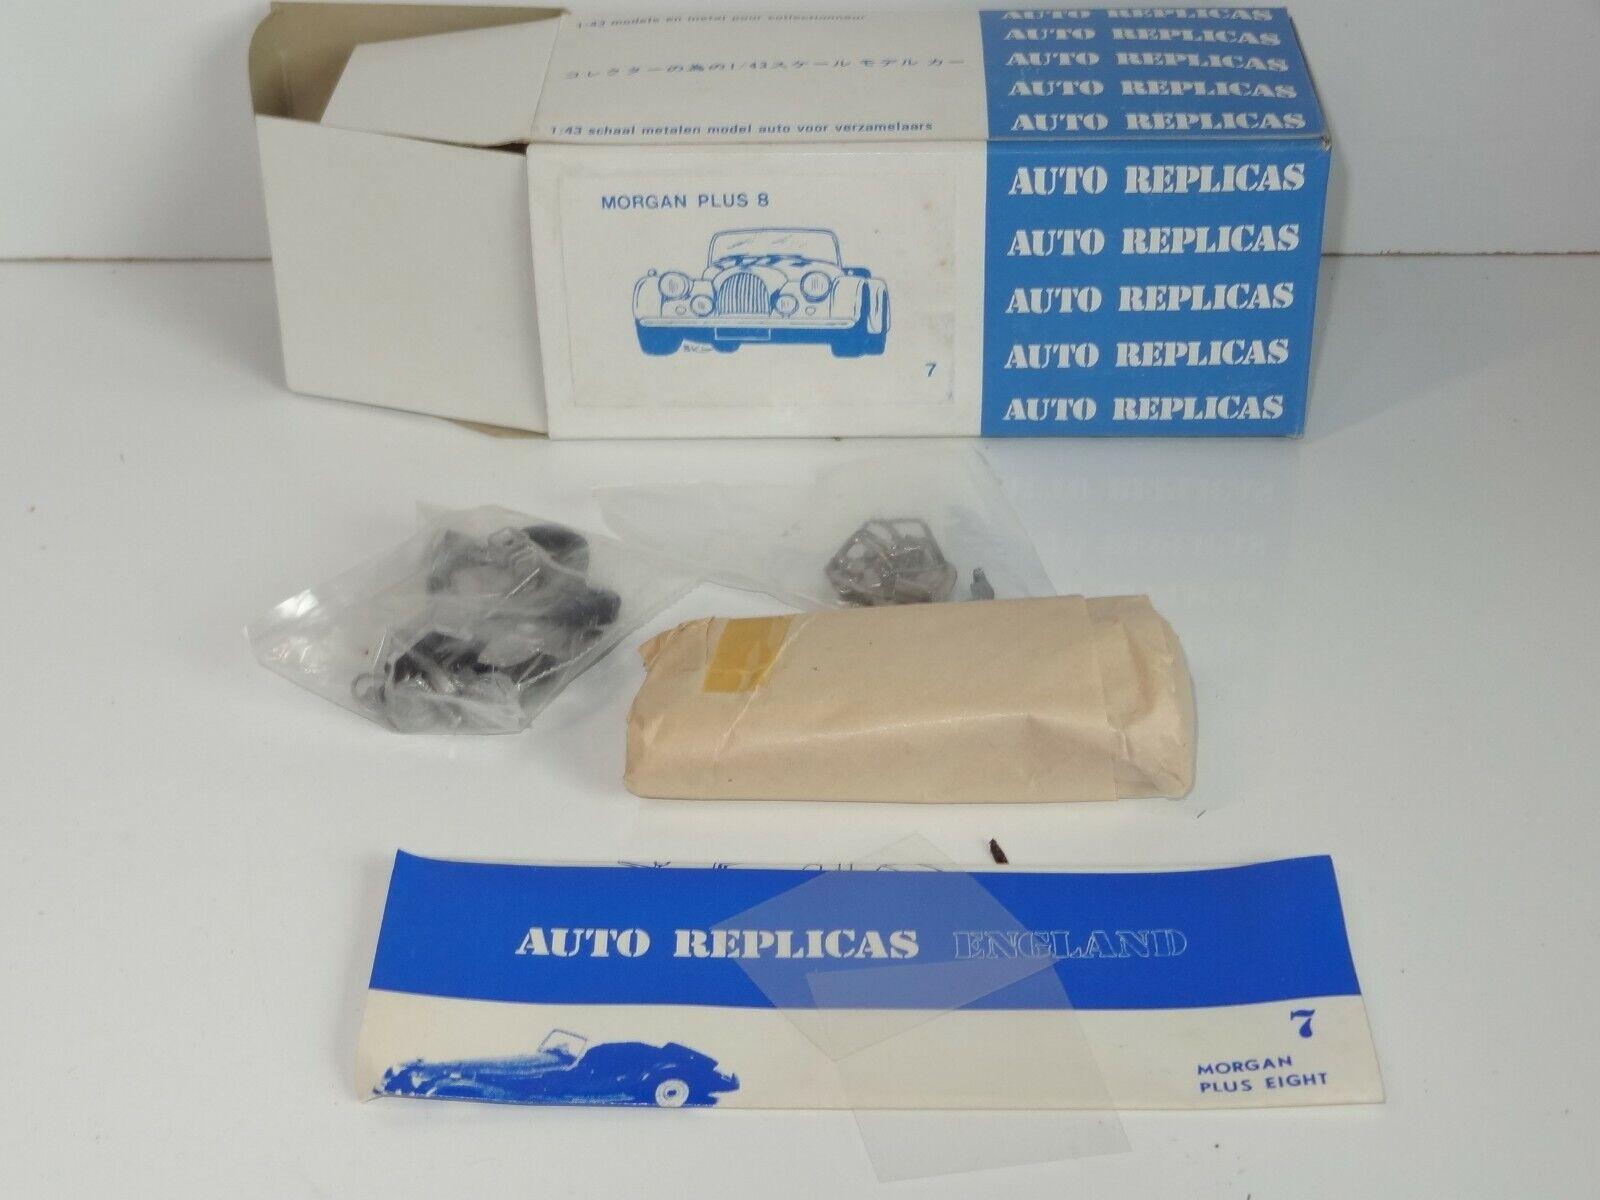 Auto replicas Métal Blanc Kit Morgan Plus 8 - 7 (209)